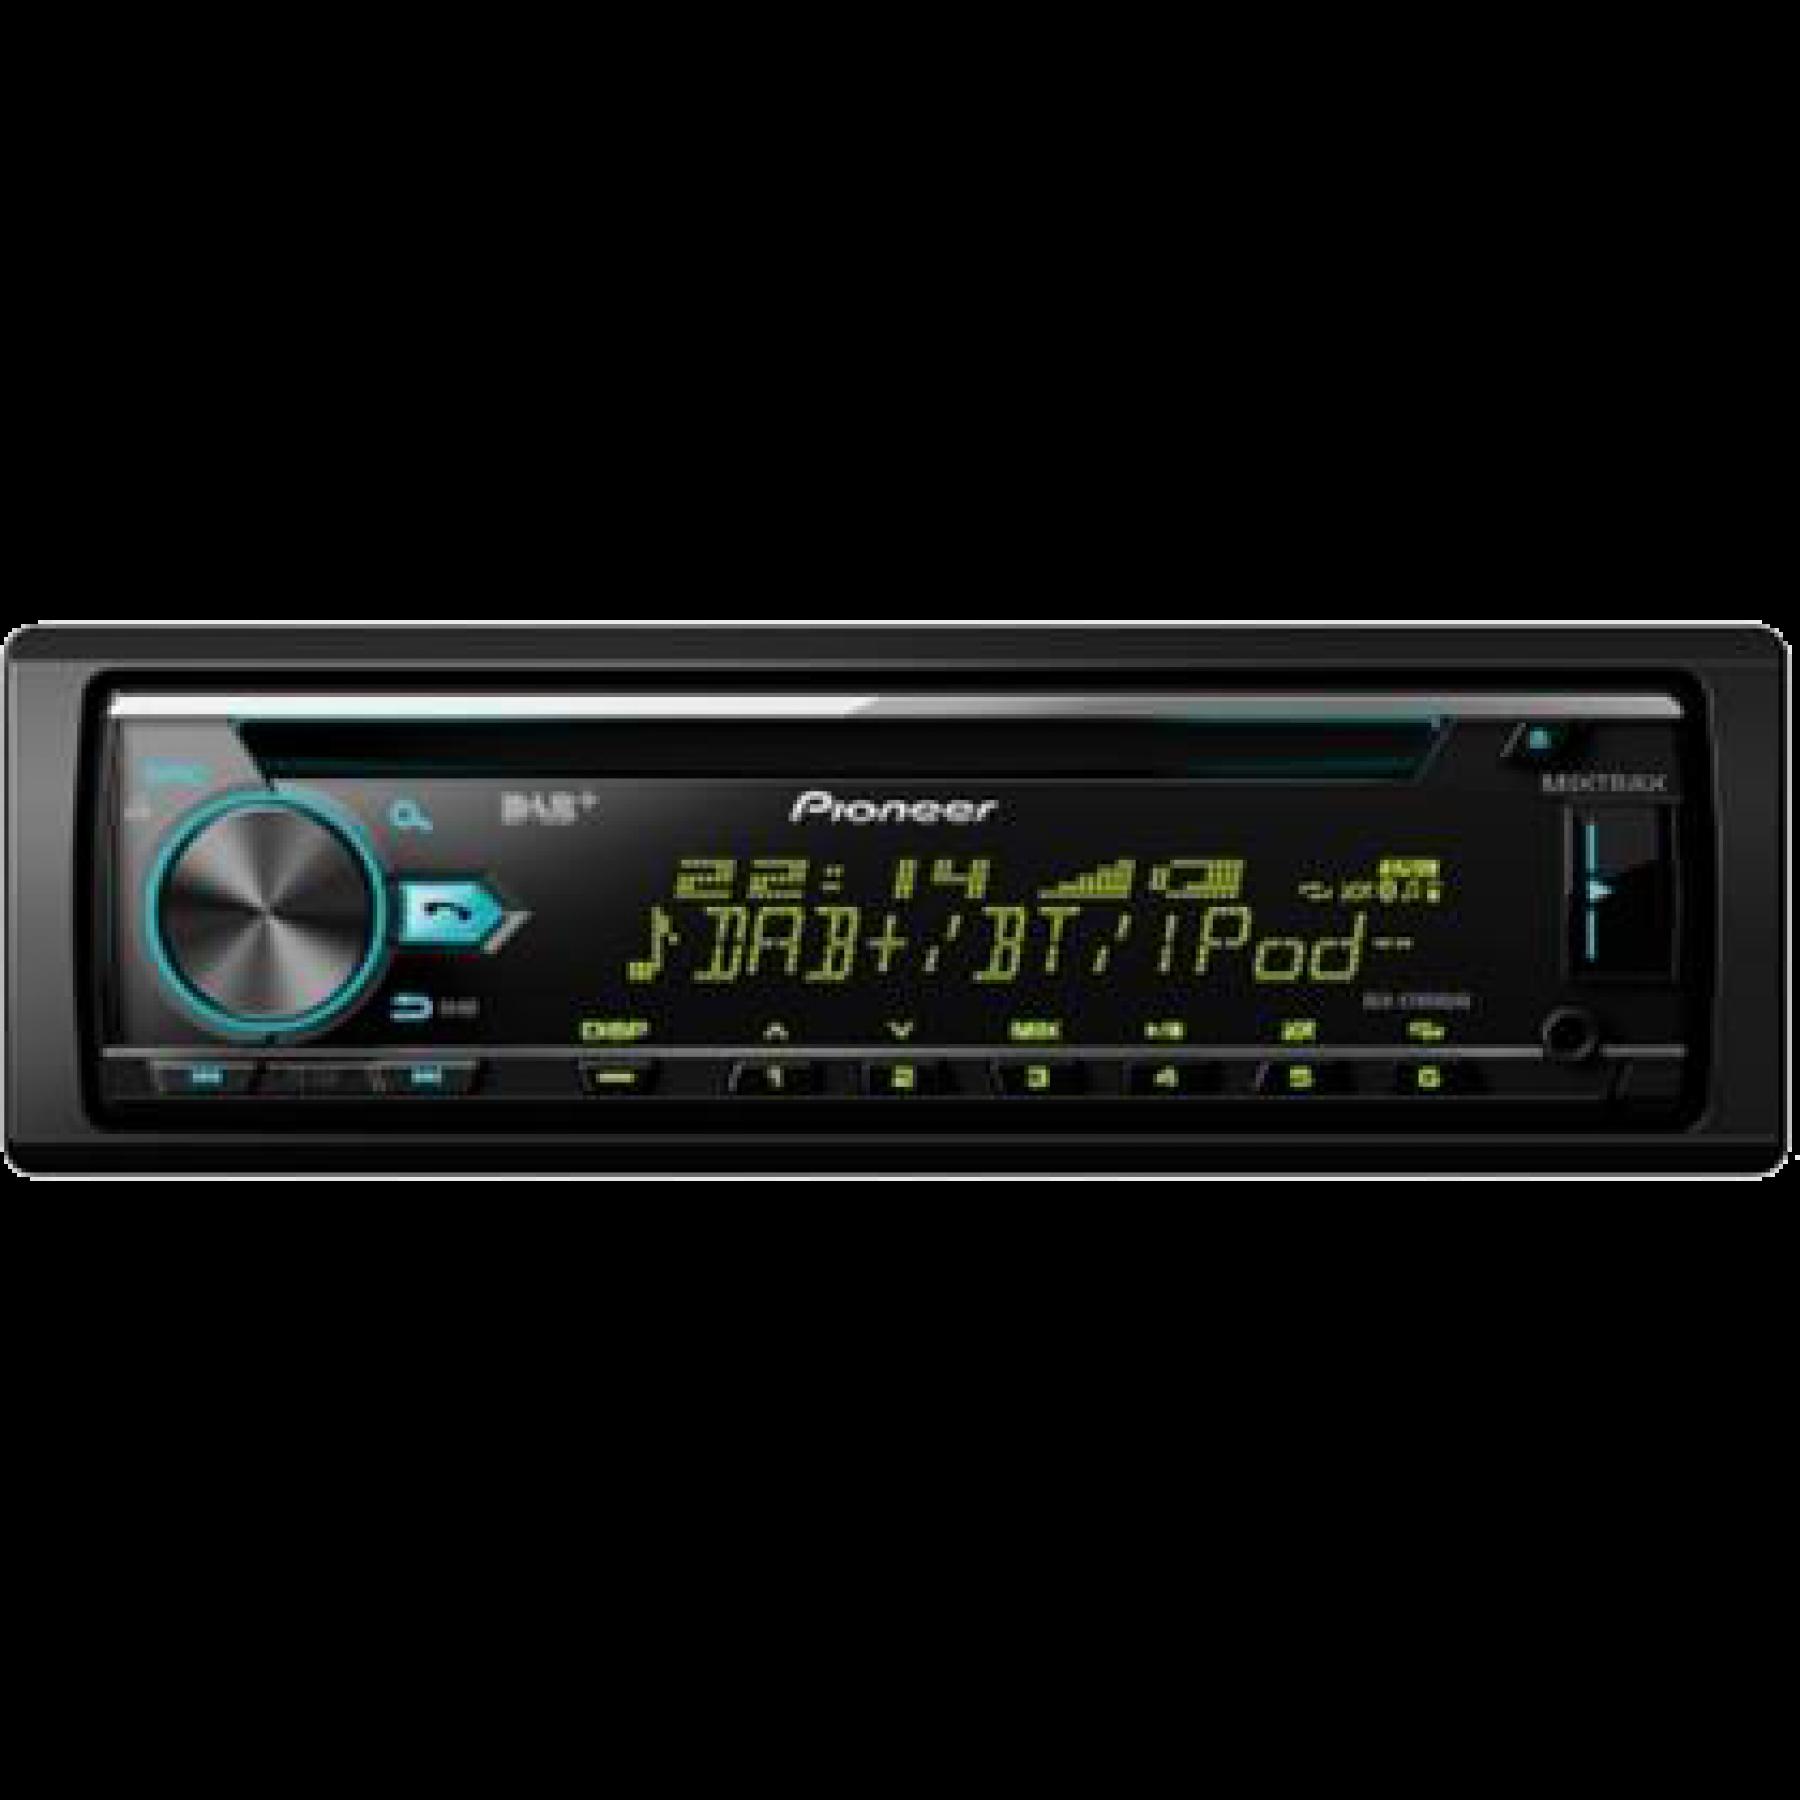 Pioneer DEHX7800DAB radio digitaal cd/usb/Bleutooth